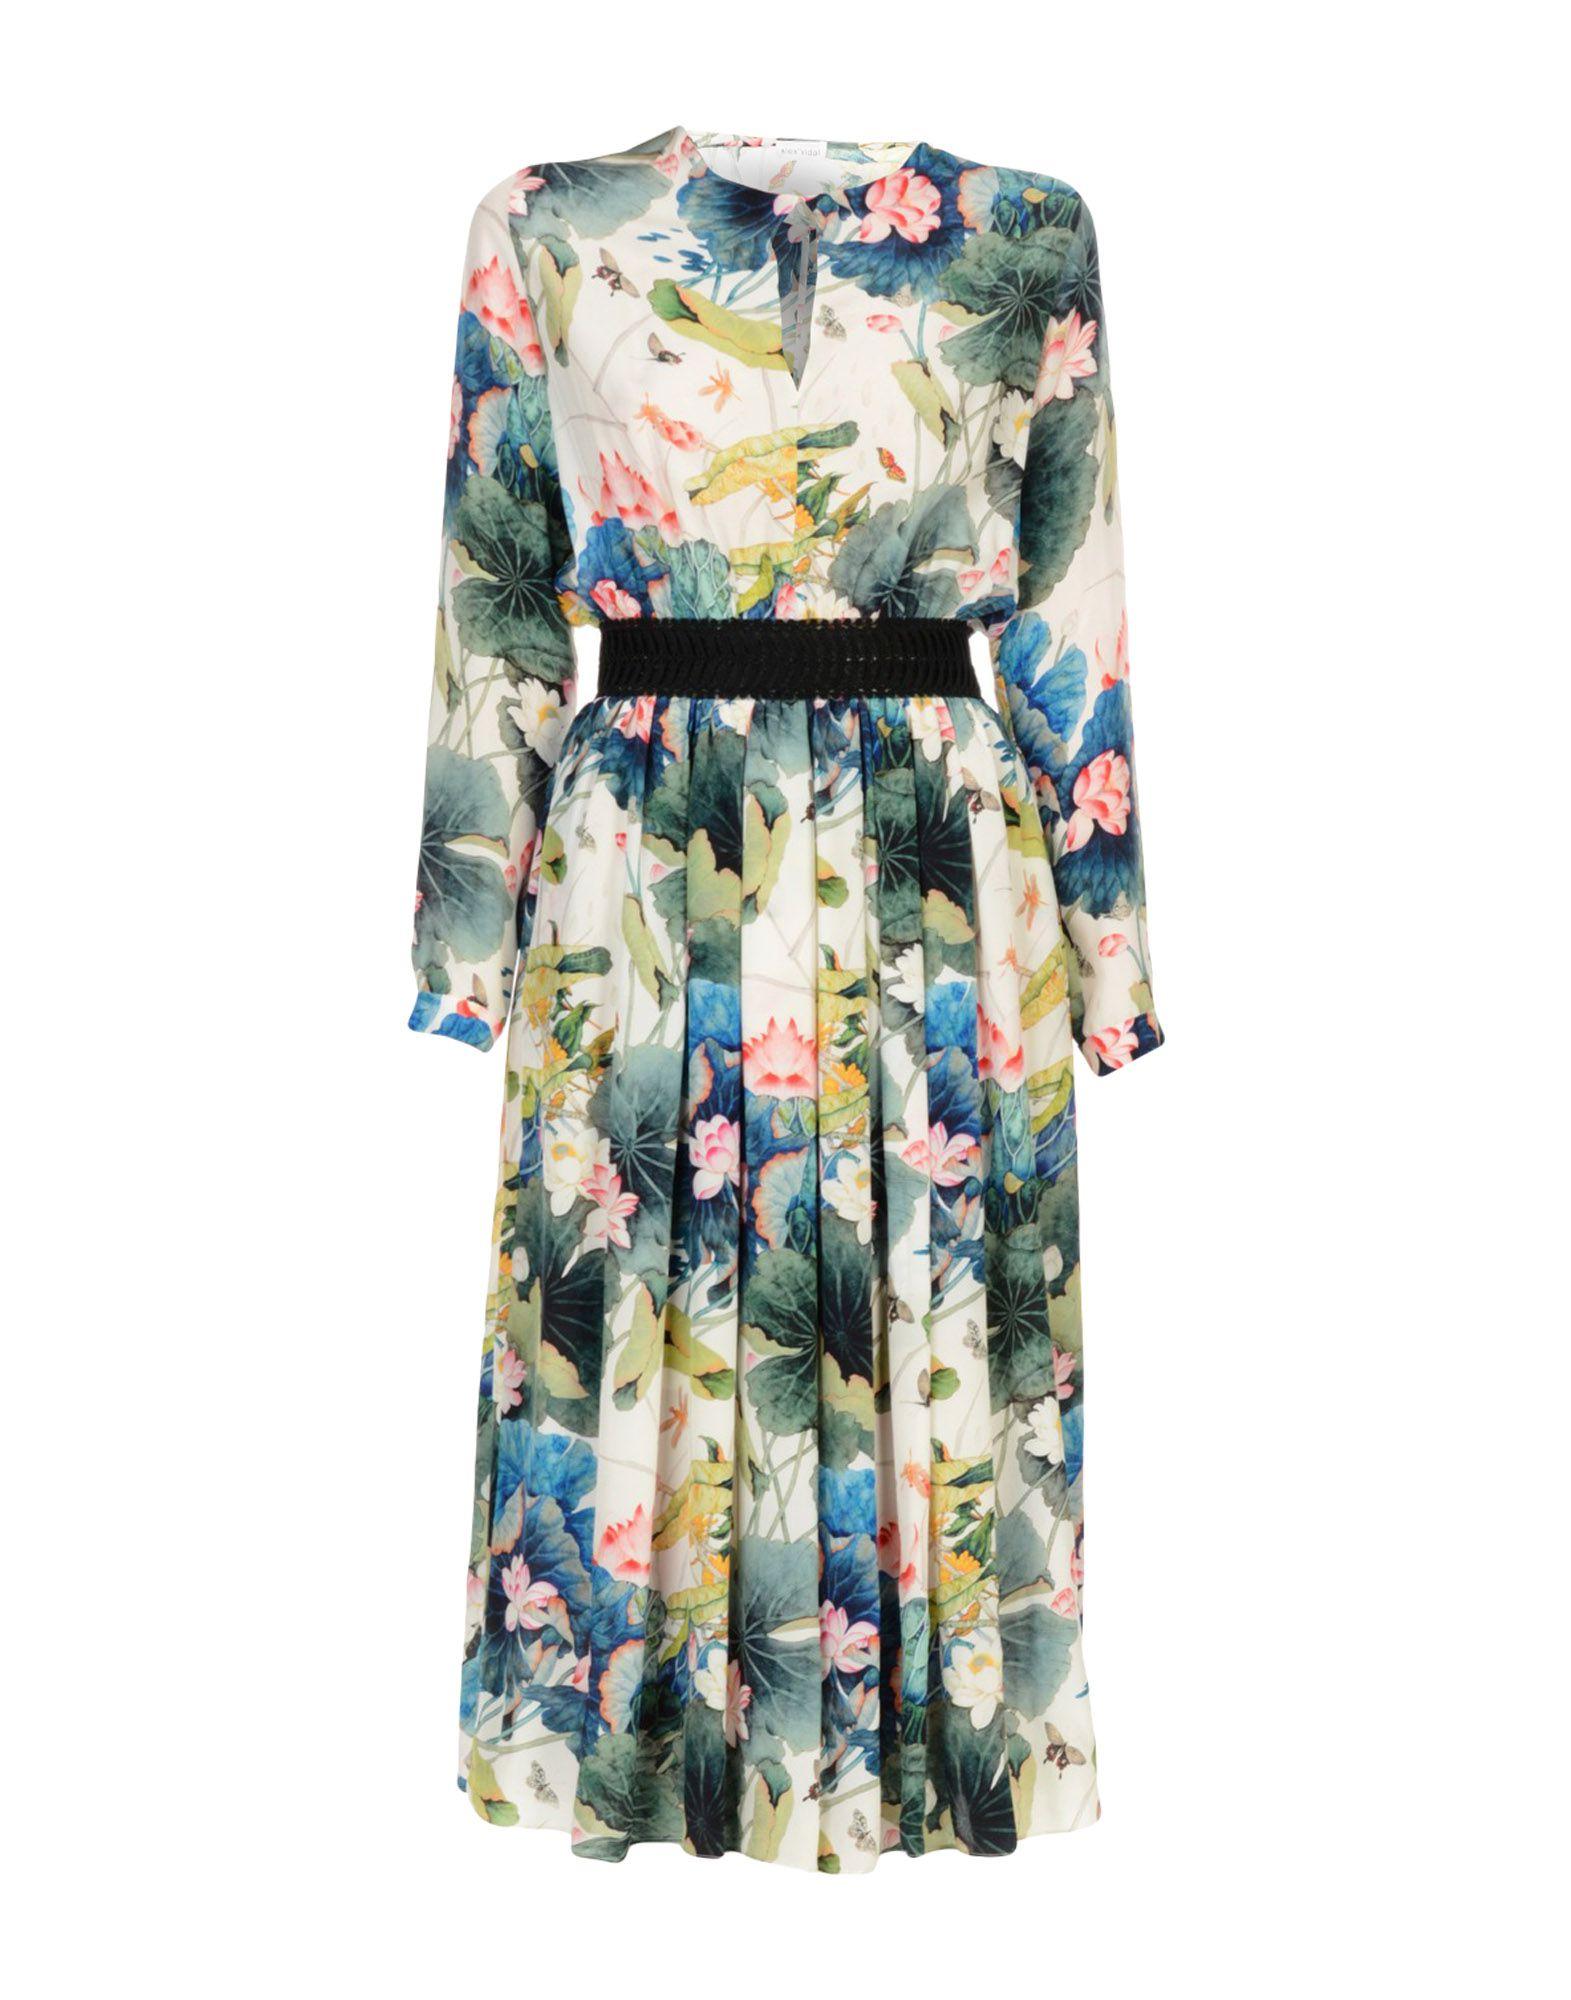 ALEX VIDAL Платье длиной 3/4 платье alex lu alex lu mp002xw0jbke